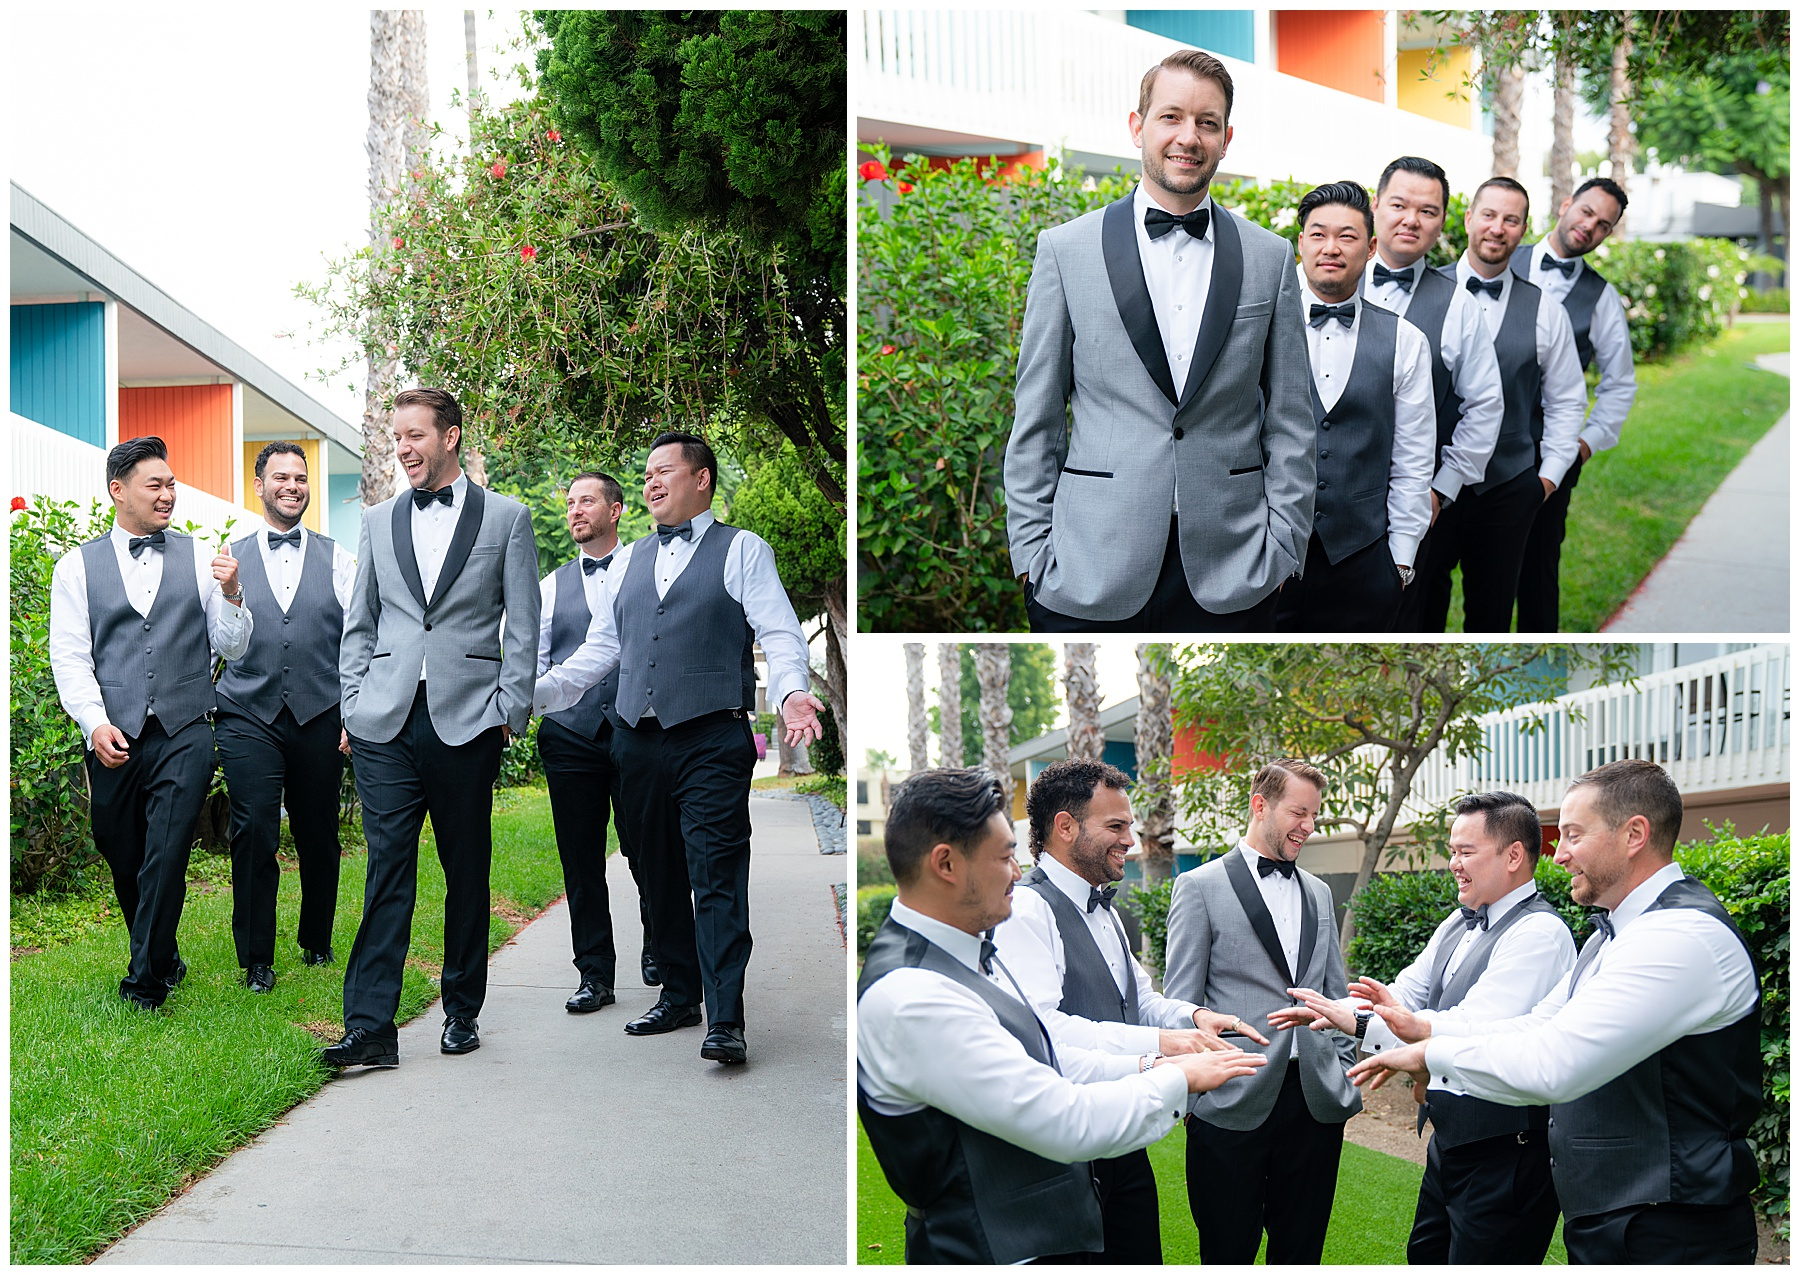 anaheim hotel groomsmen getting ready